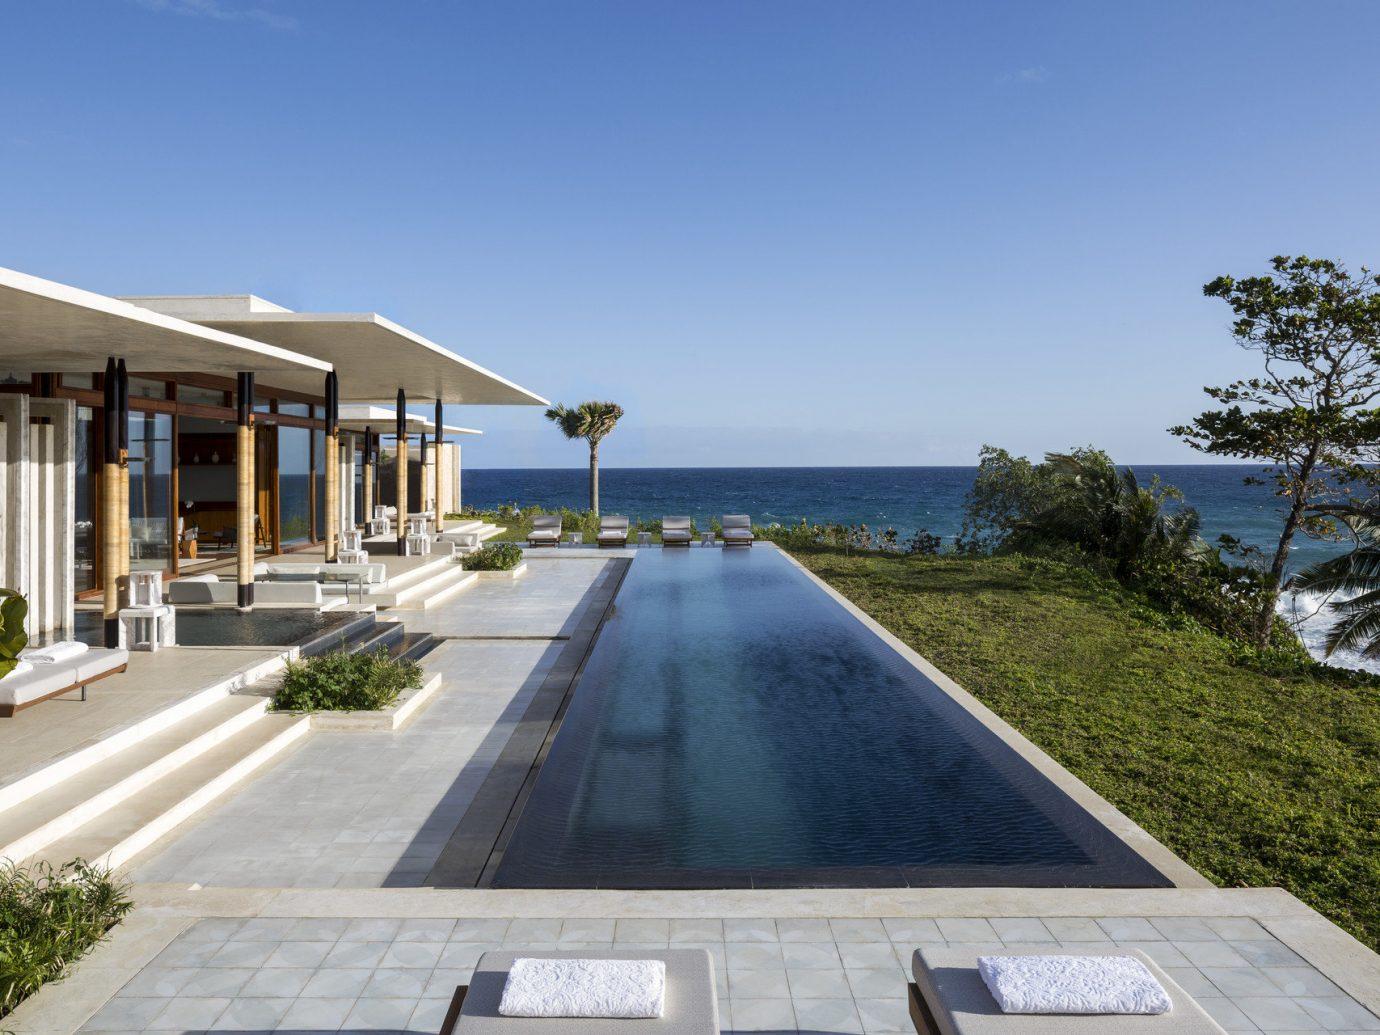 Pool at Amanera, Dominican Republic, Caribbean